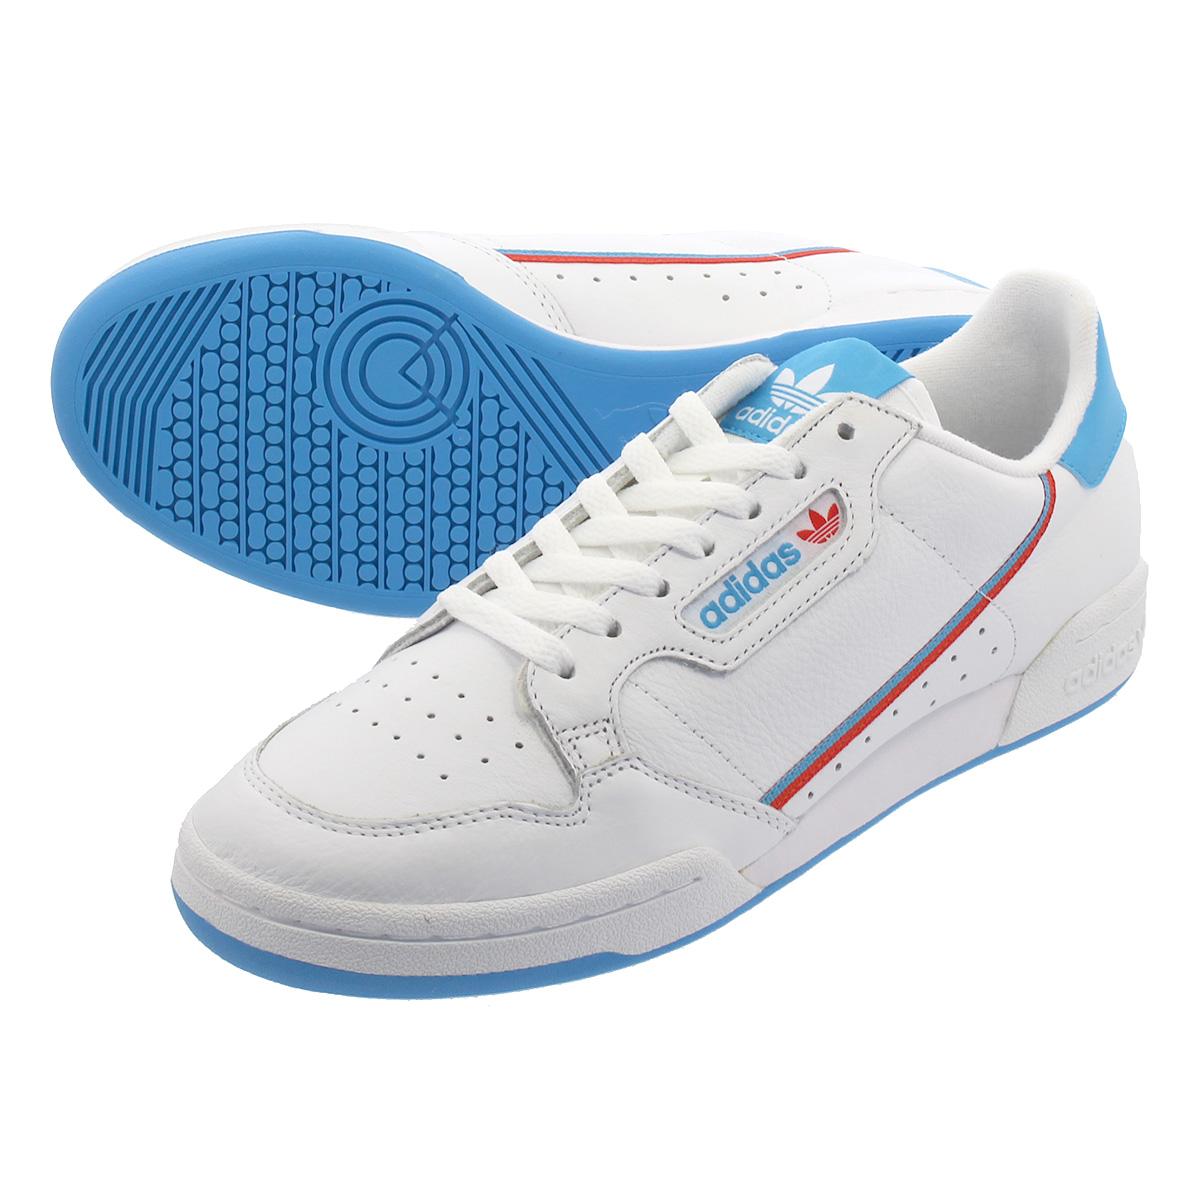 adidas CONTINENTAL 80 アディダス コンチネンタル 80 RUNNING WHITE/SHOCK CYAN ef2942